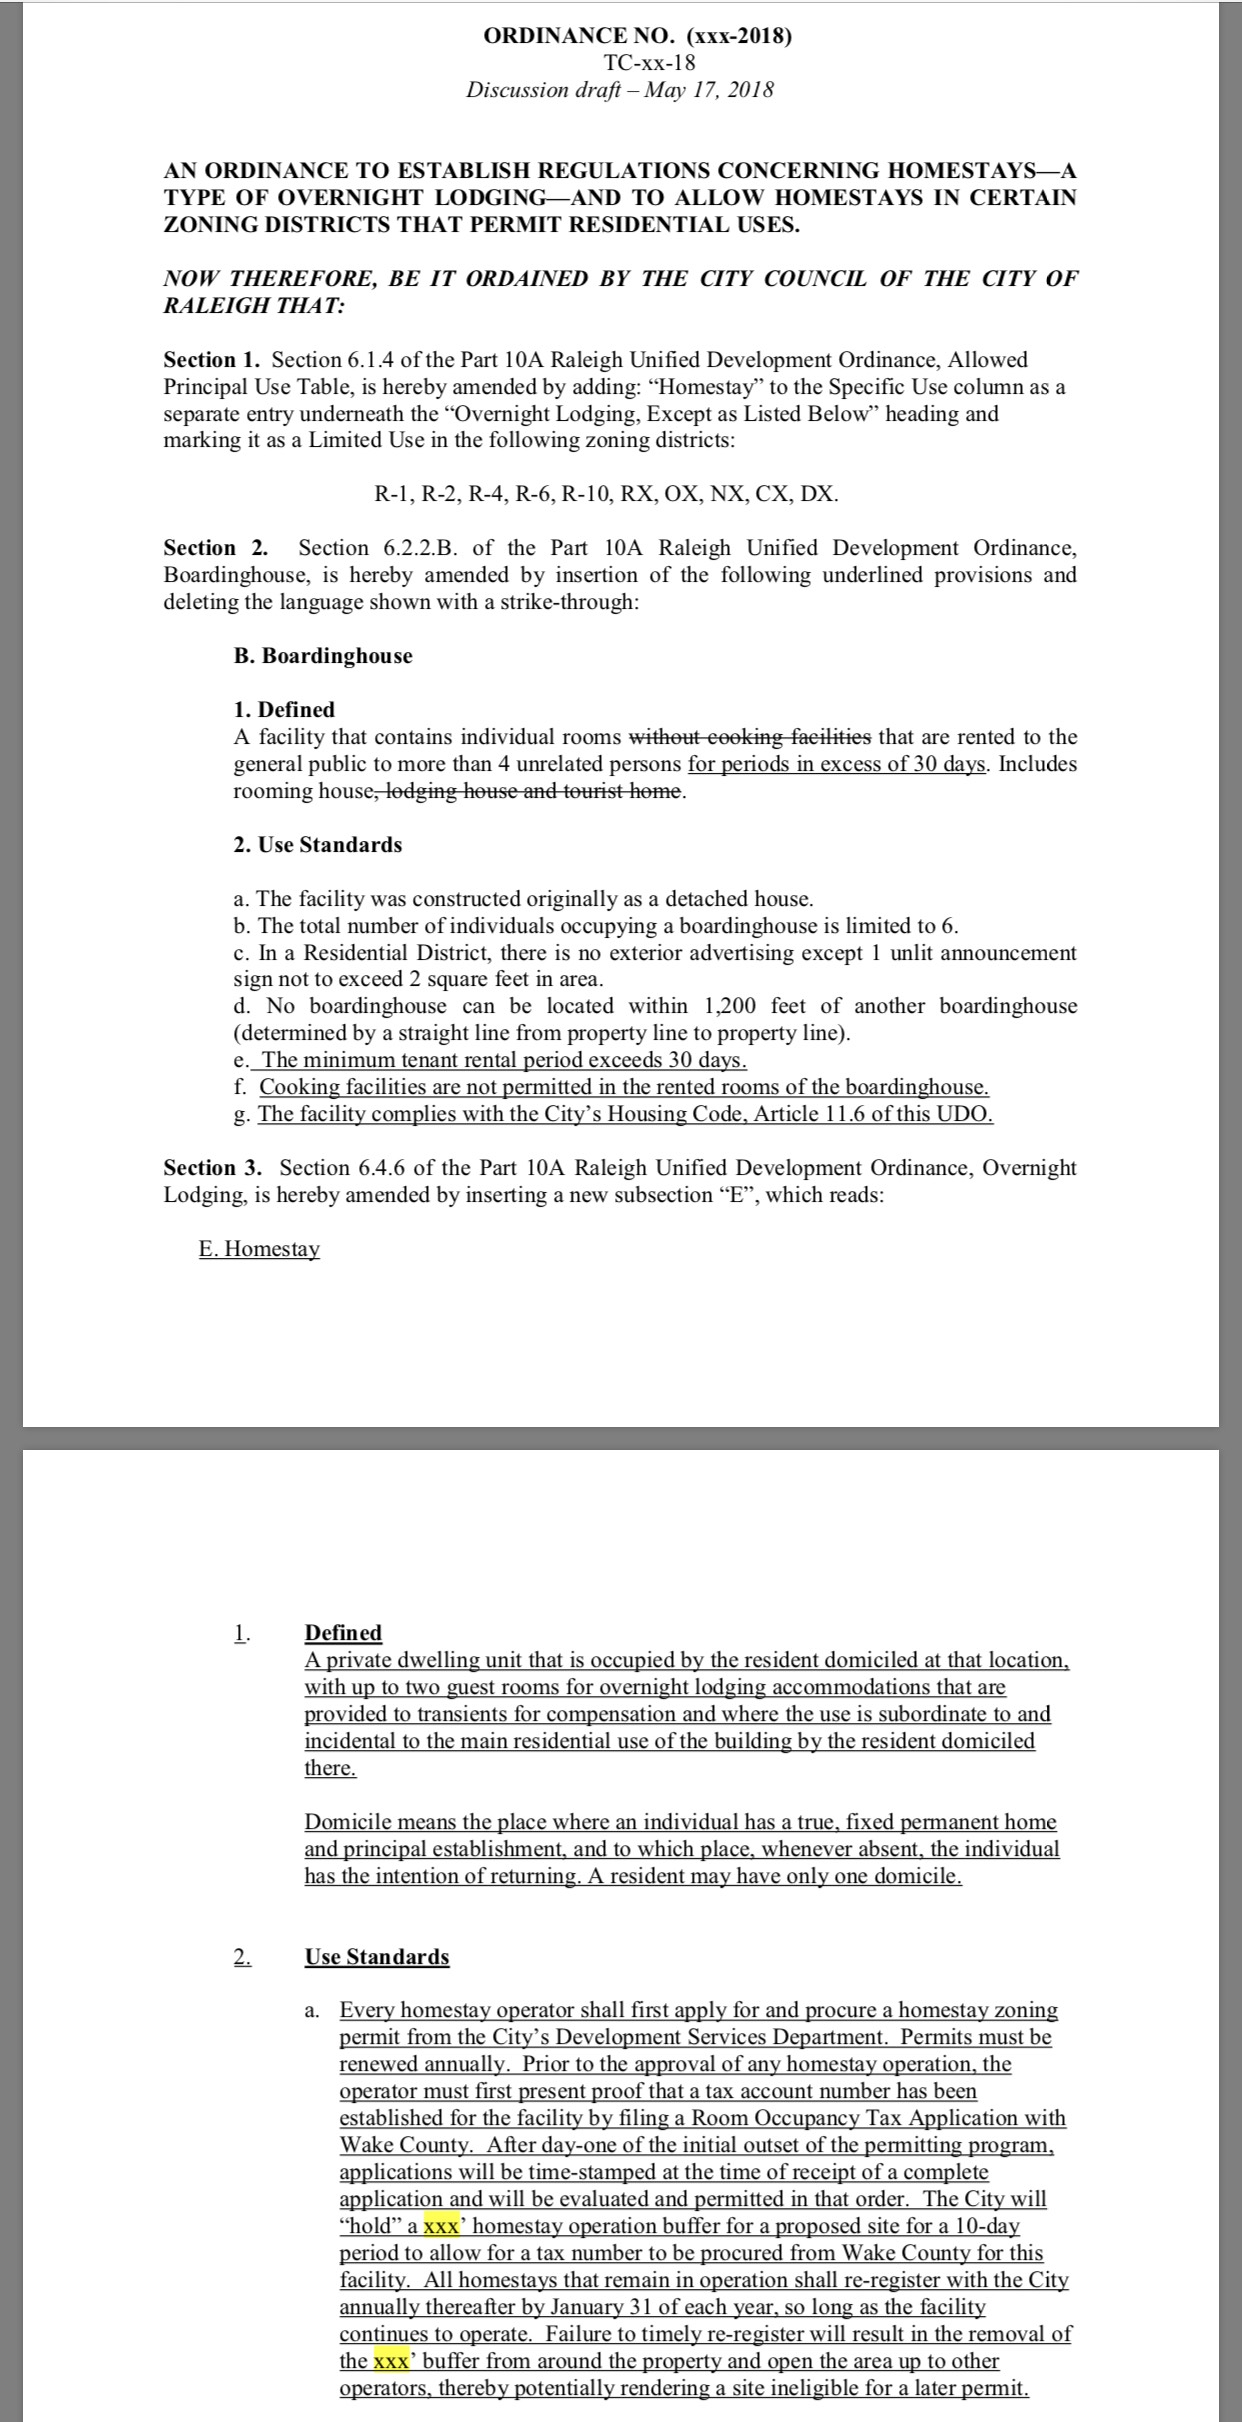 str ordinance 1_1.15.19.jpg